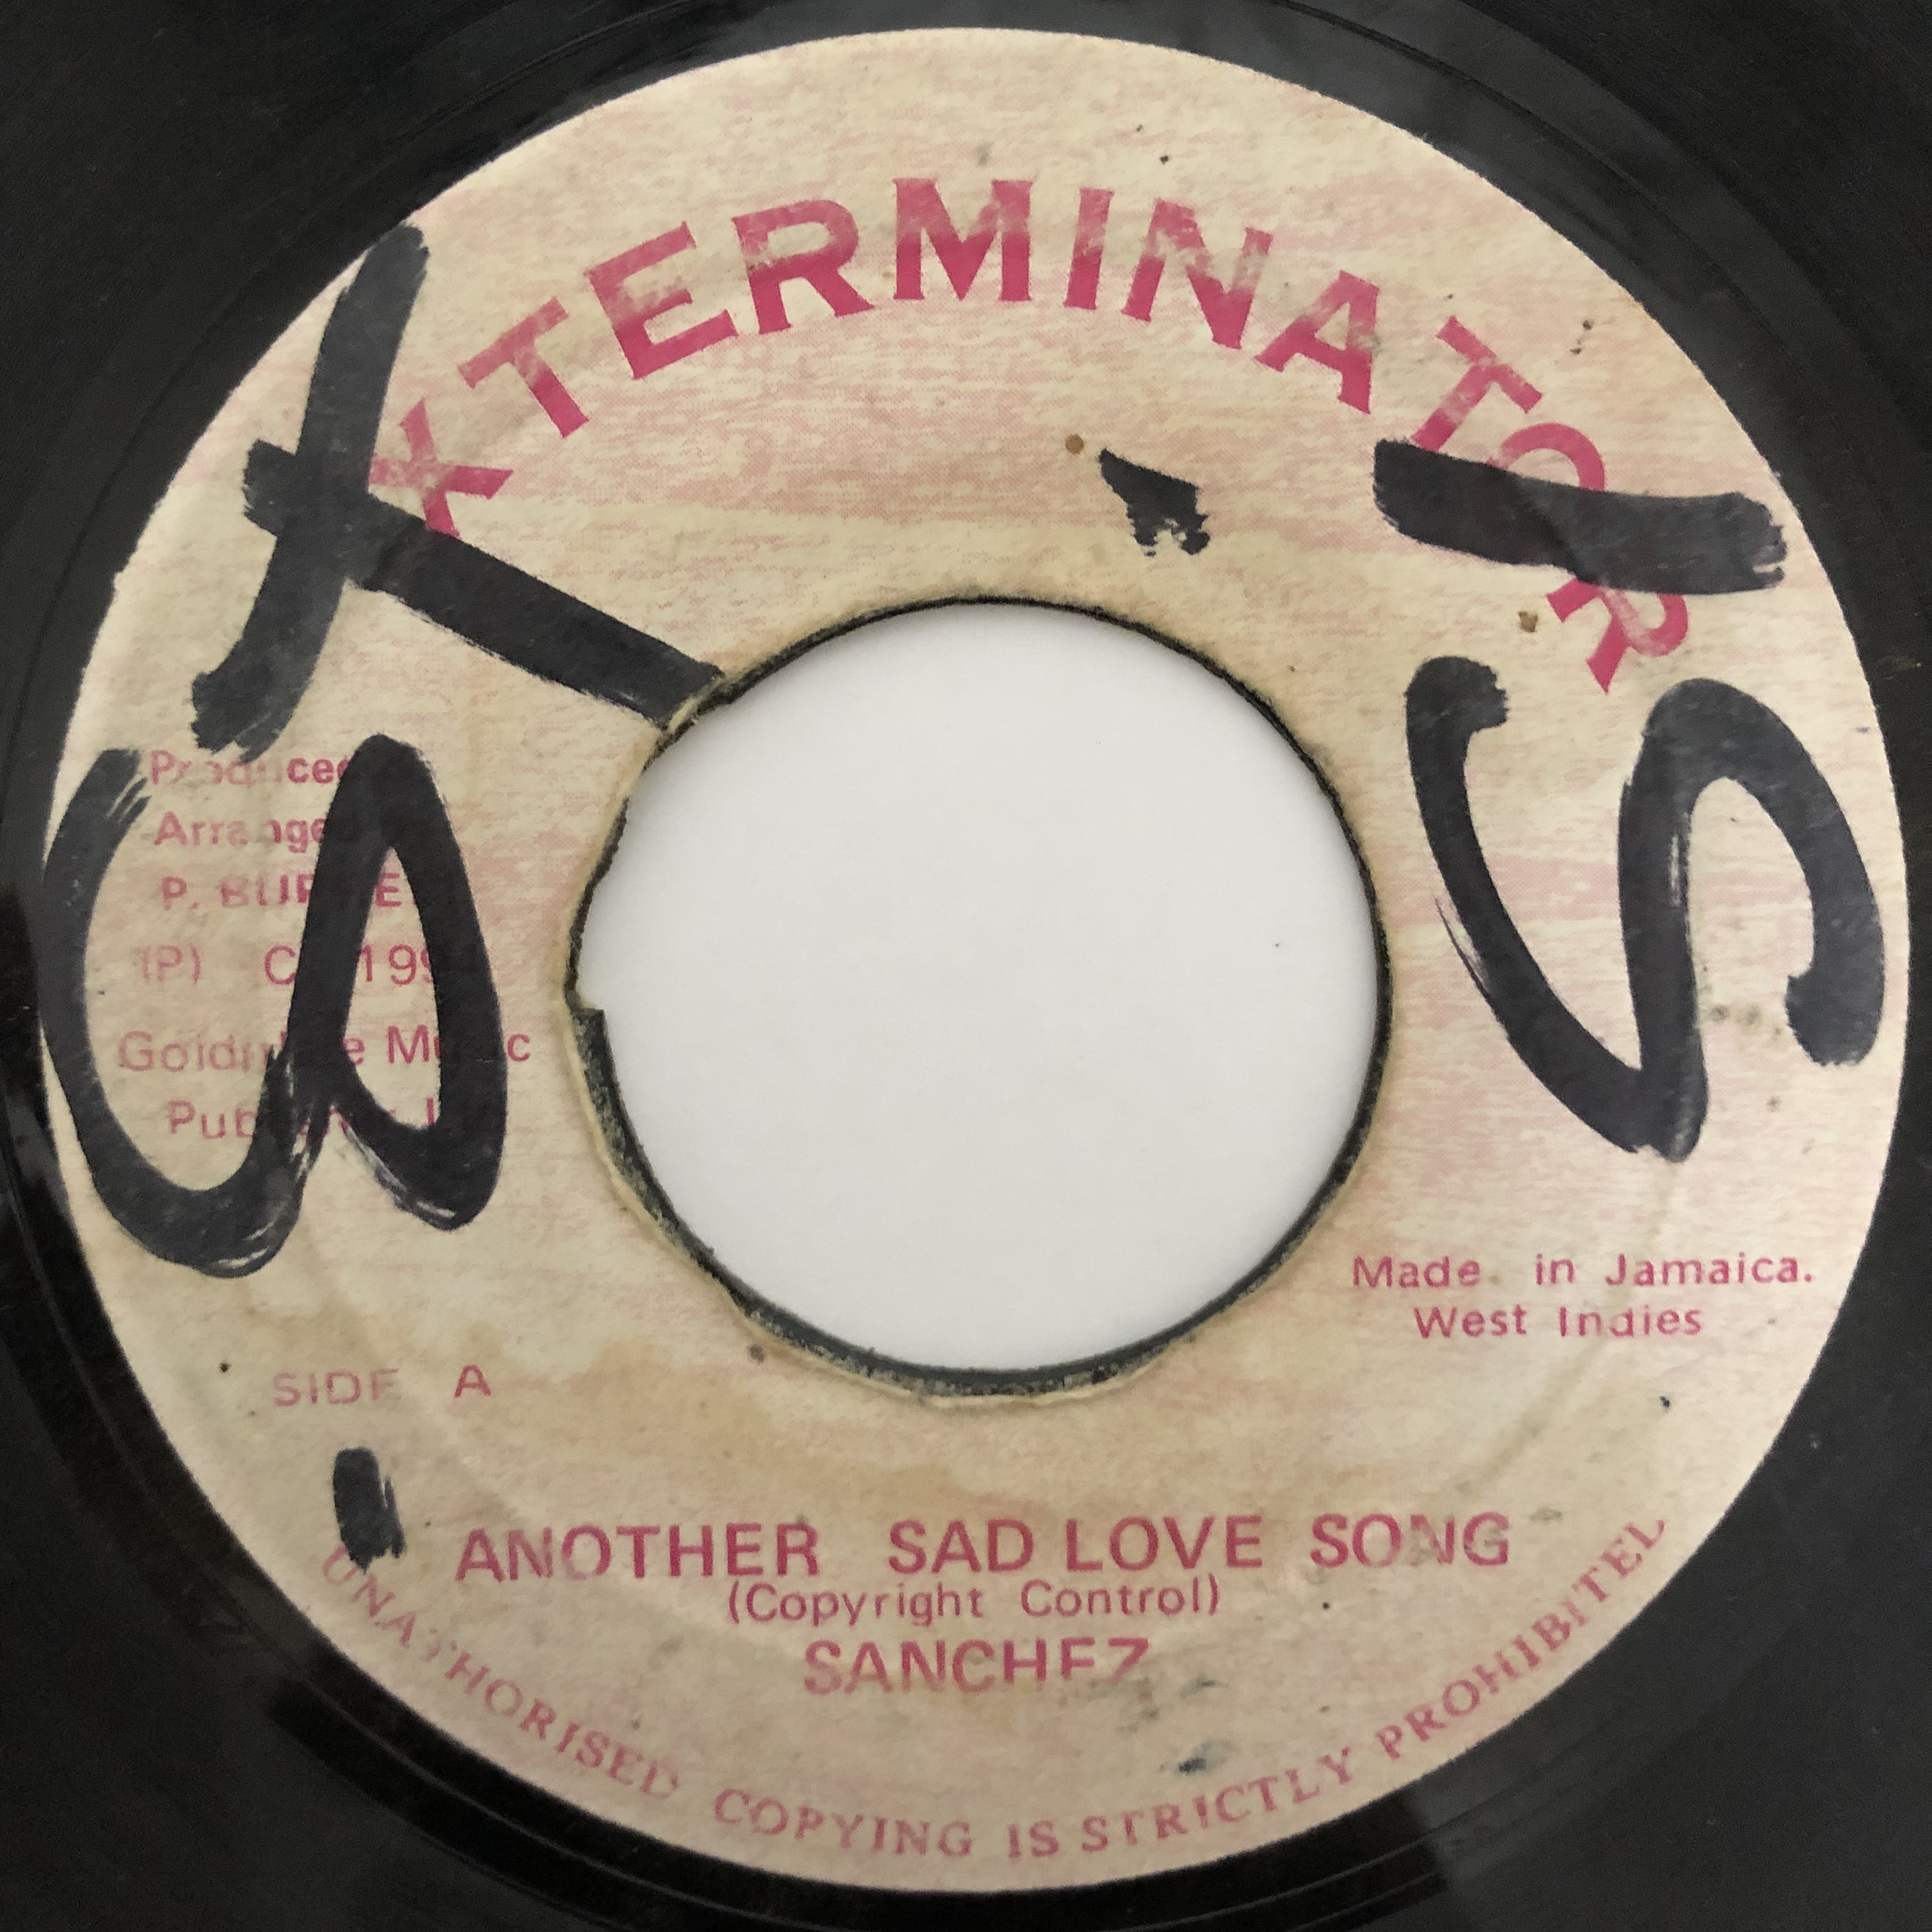 Sanchez - Another Sad Love Song【7-20445】